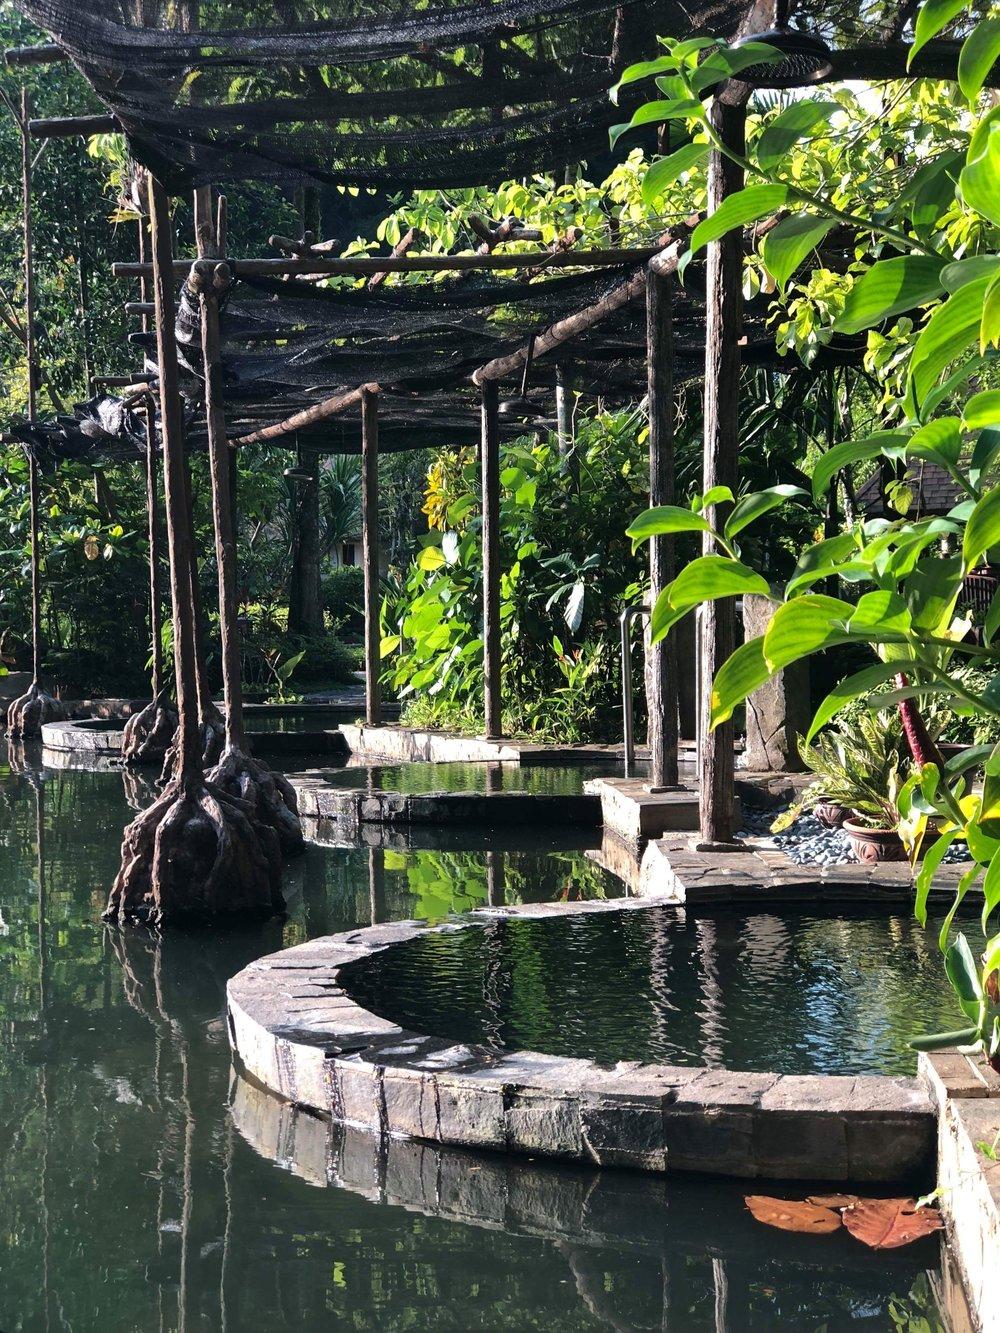 Hot Springs on the Equator - The Banjaran Resort Ipoh, Malaysia